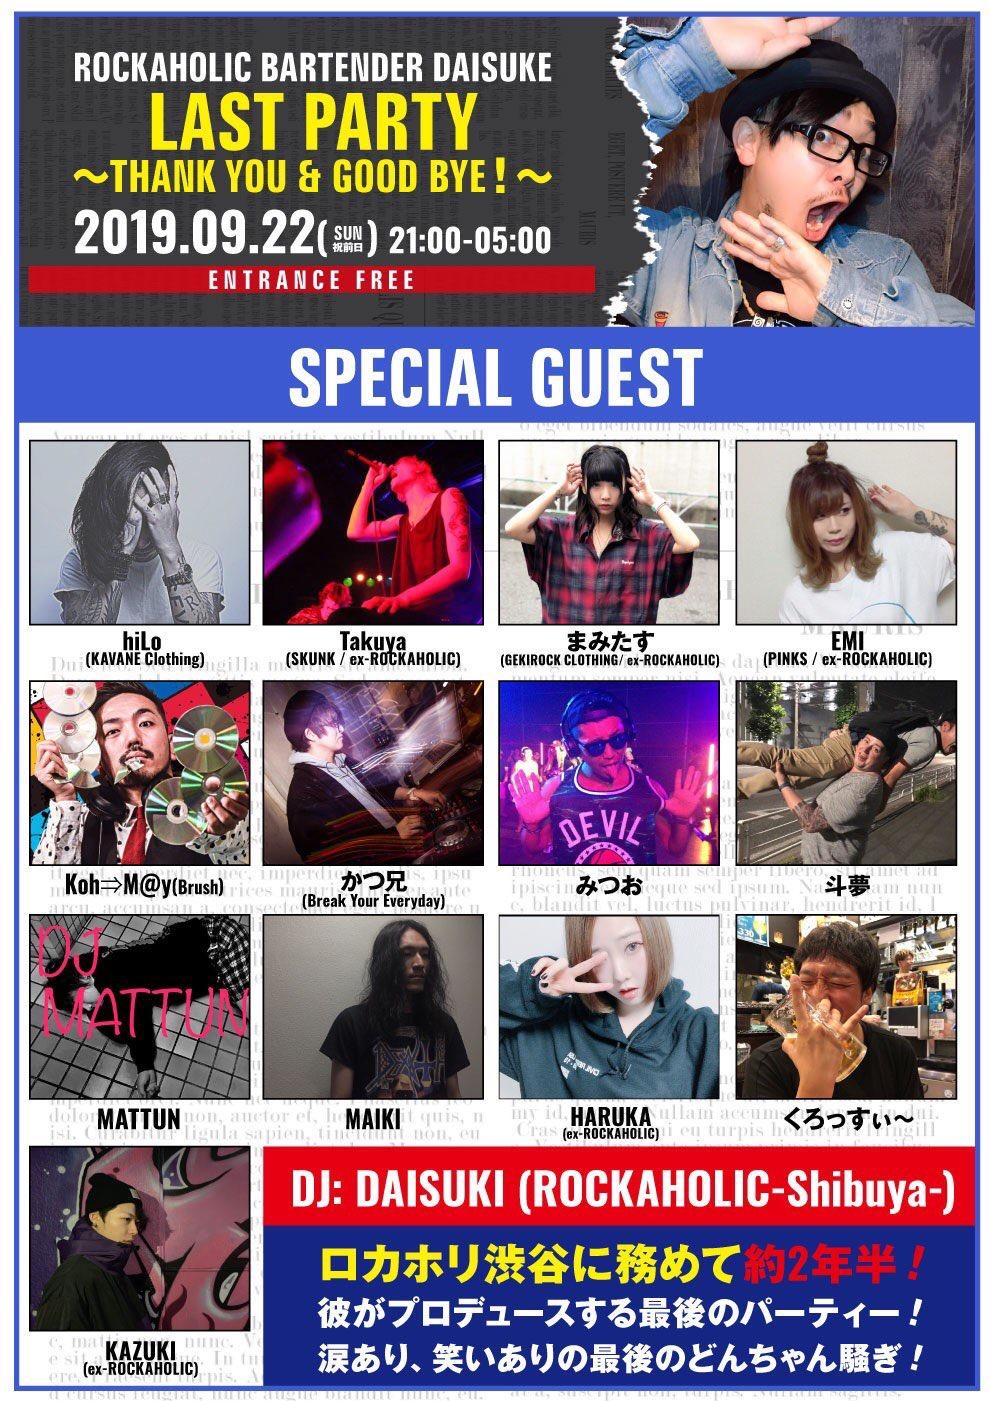 https://bar-rockaholic.jp/shibuya/blog/101DC114-B7D6-46FE-9251-B513F9B73886.jpeg